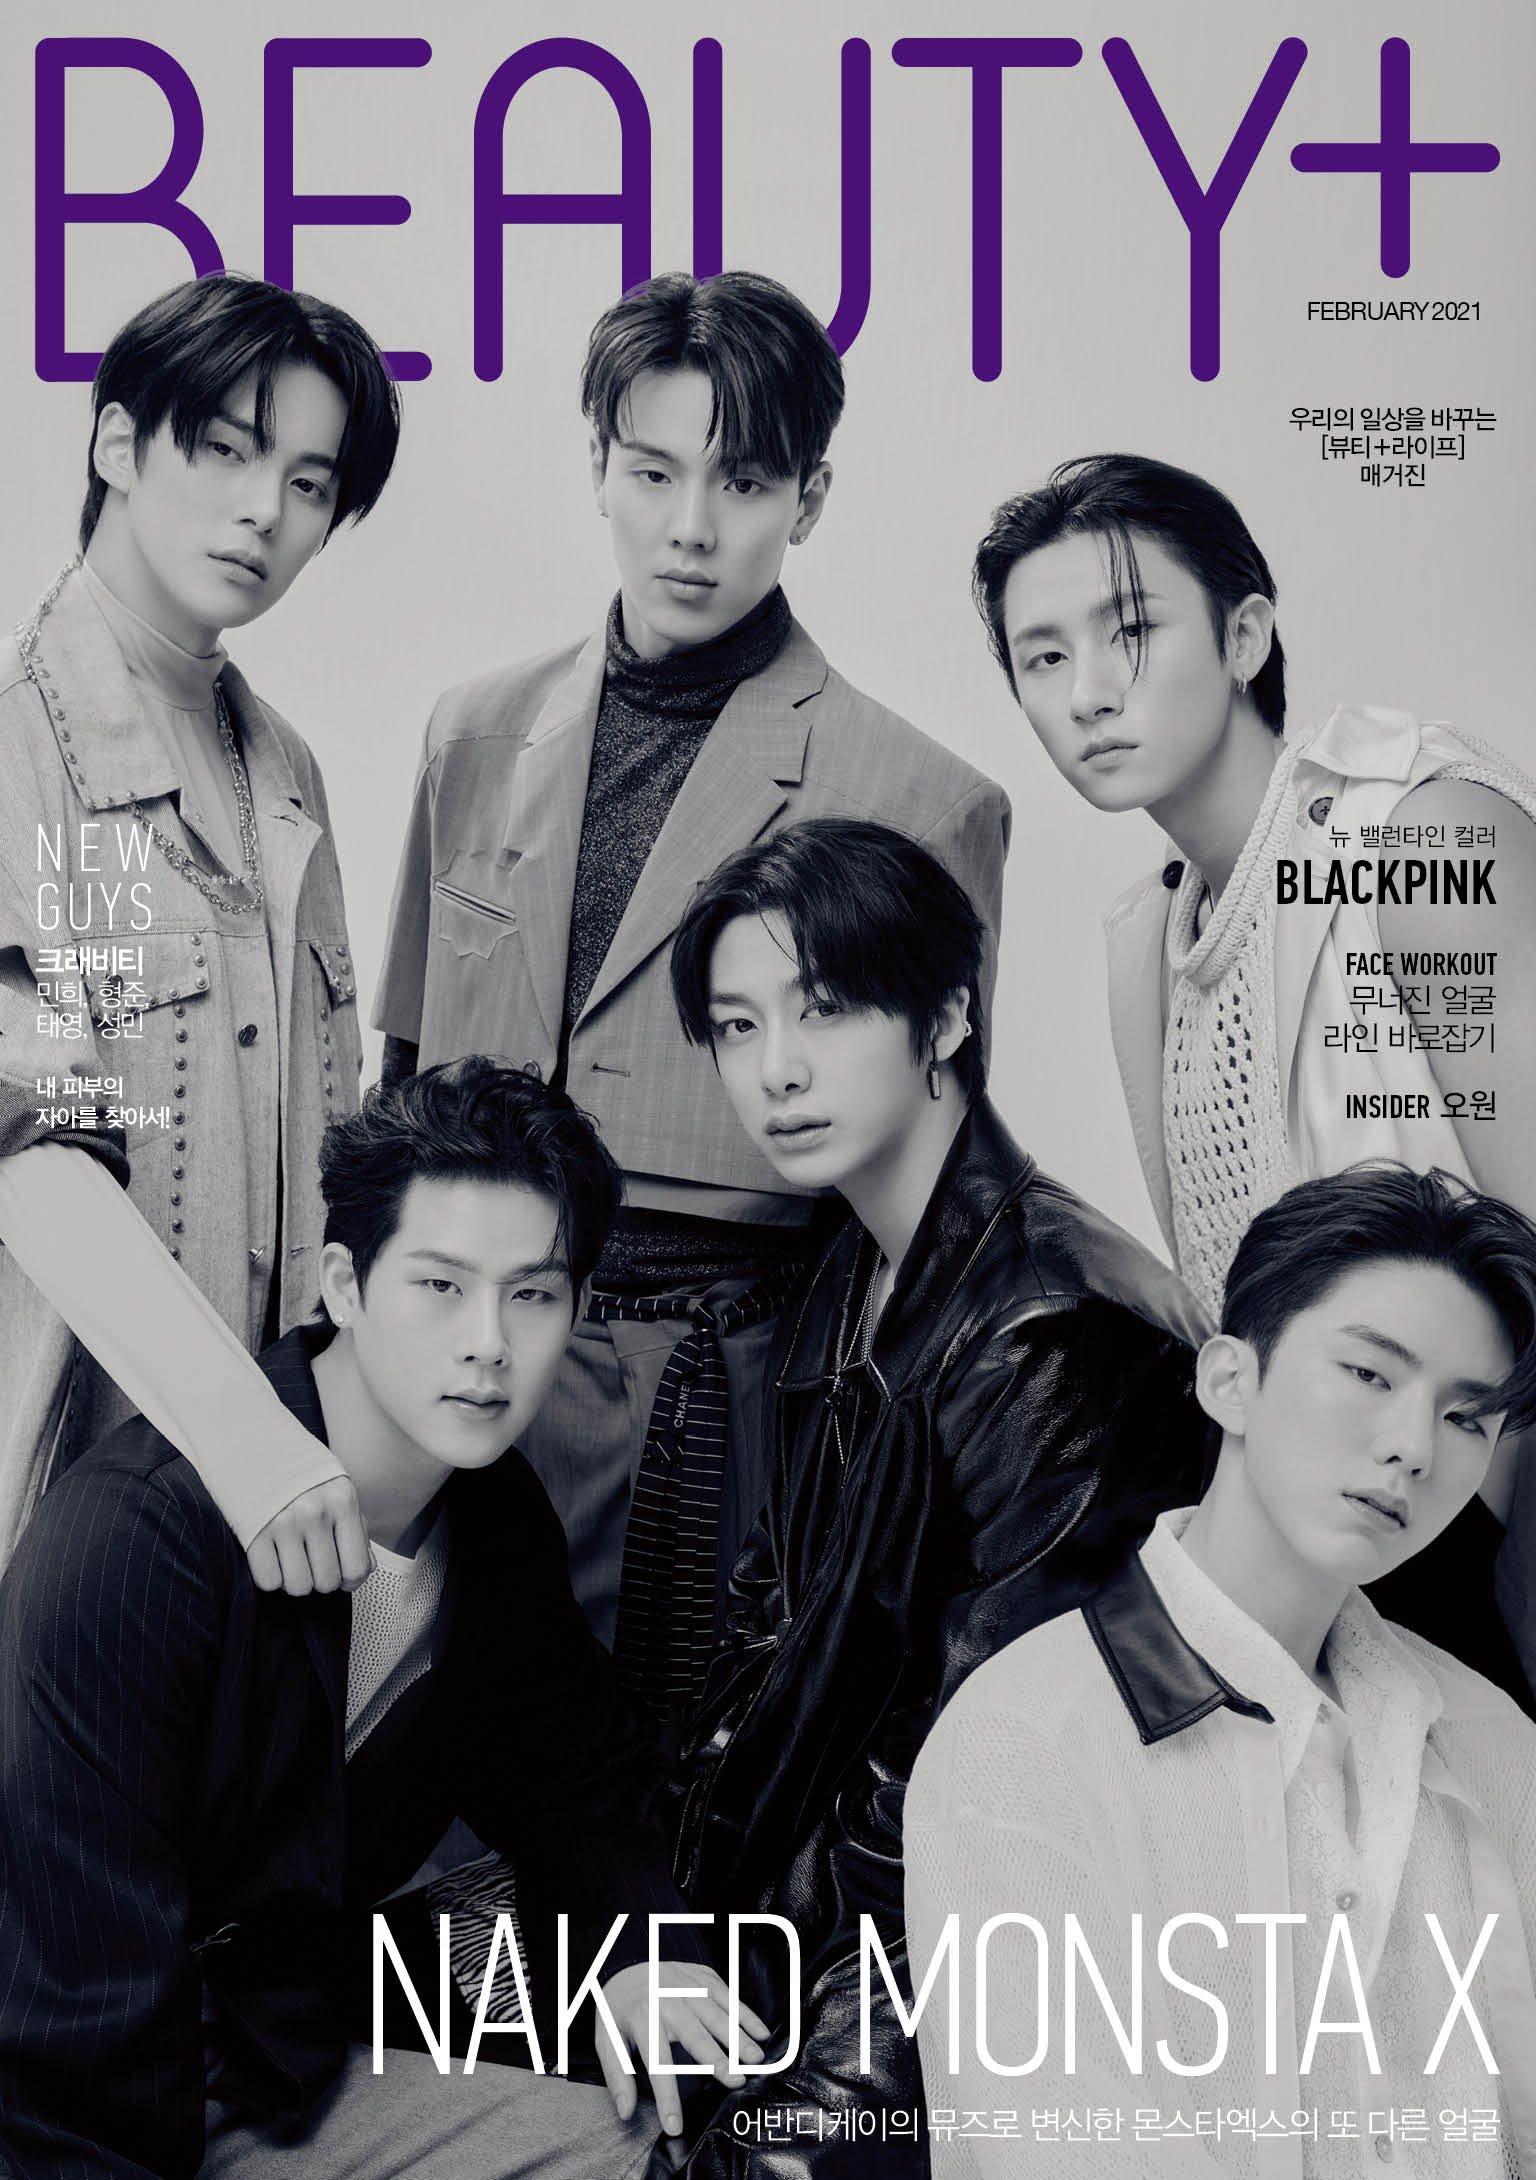 Monsta X for Beauty+ Magazine